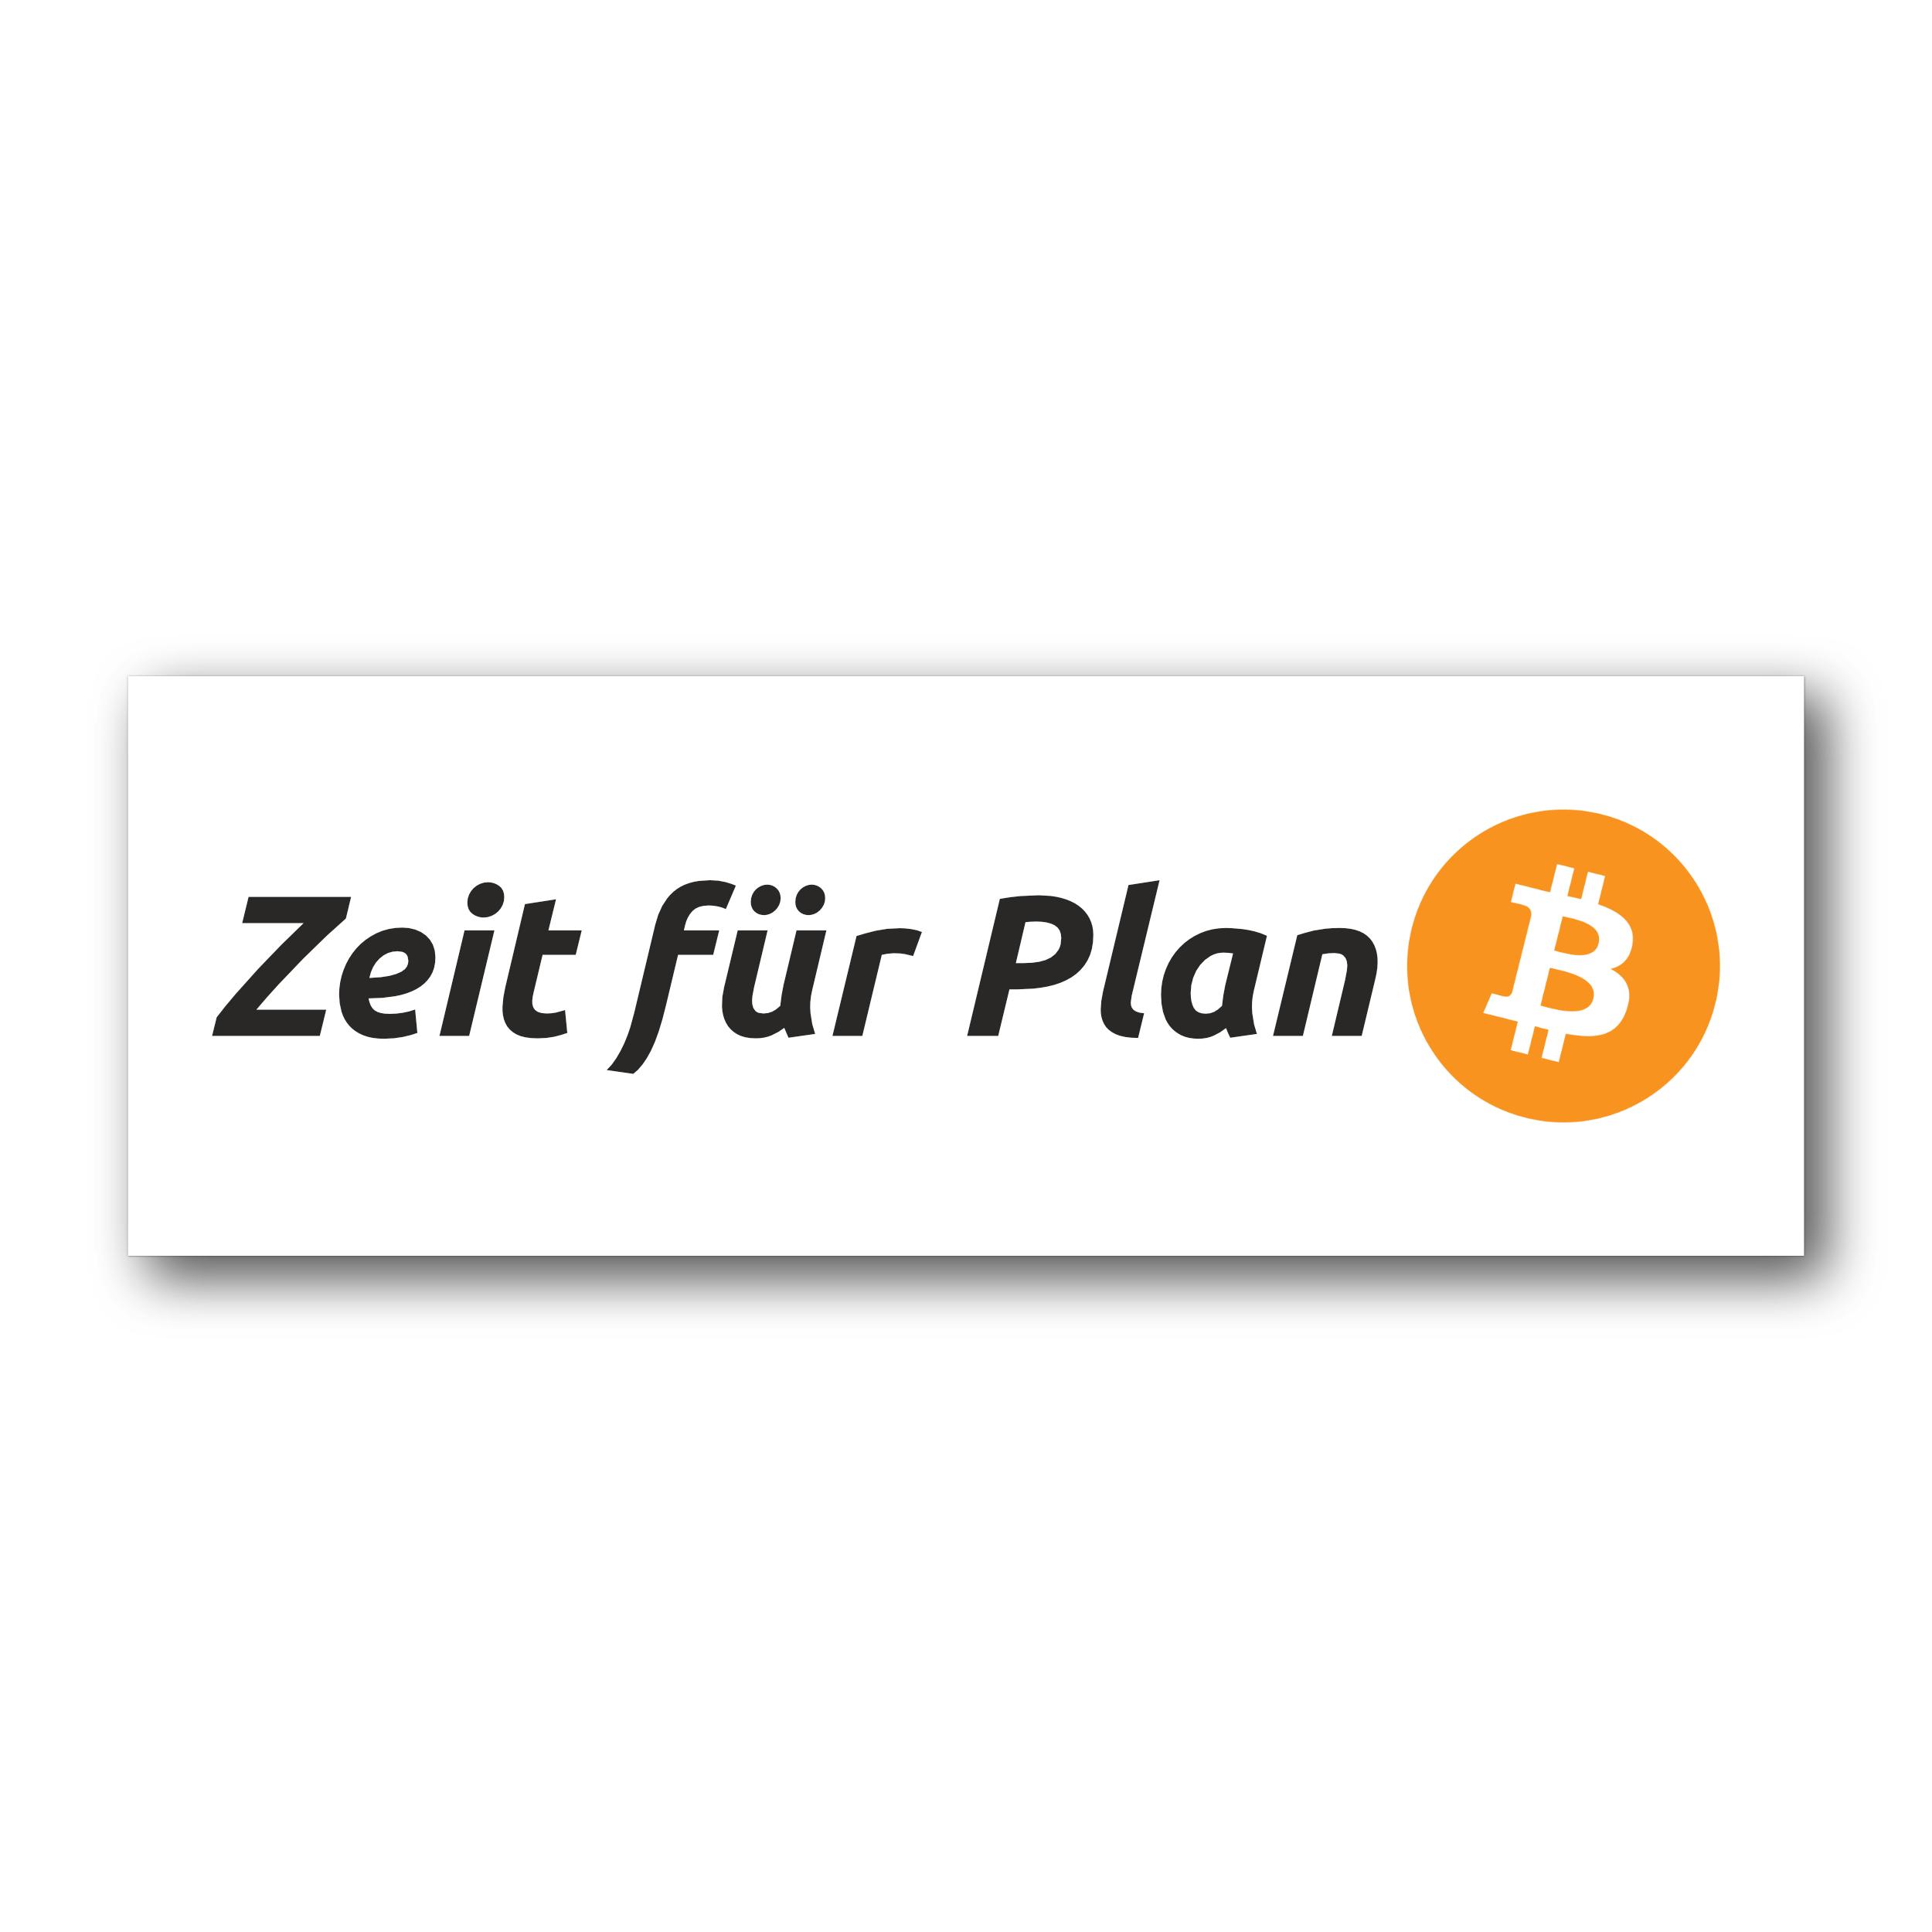 aprycot-media-bitcoin-sticker-planb_01